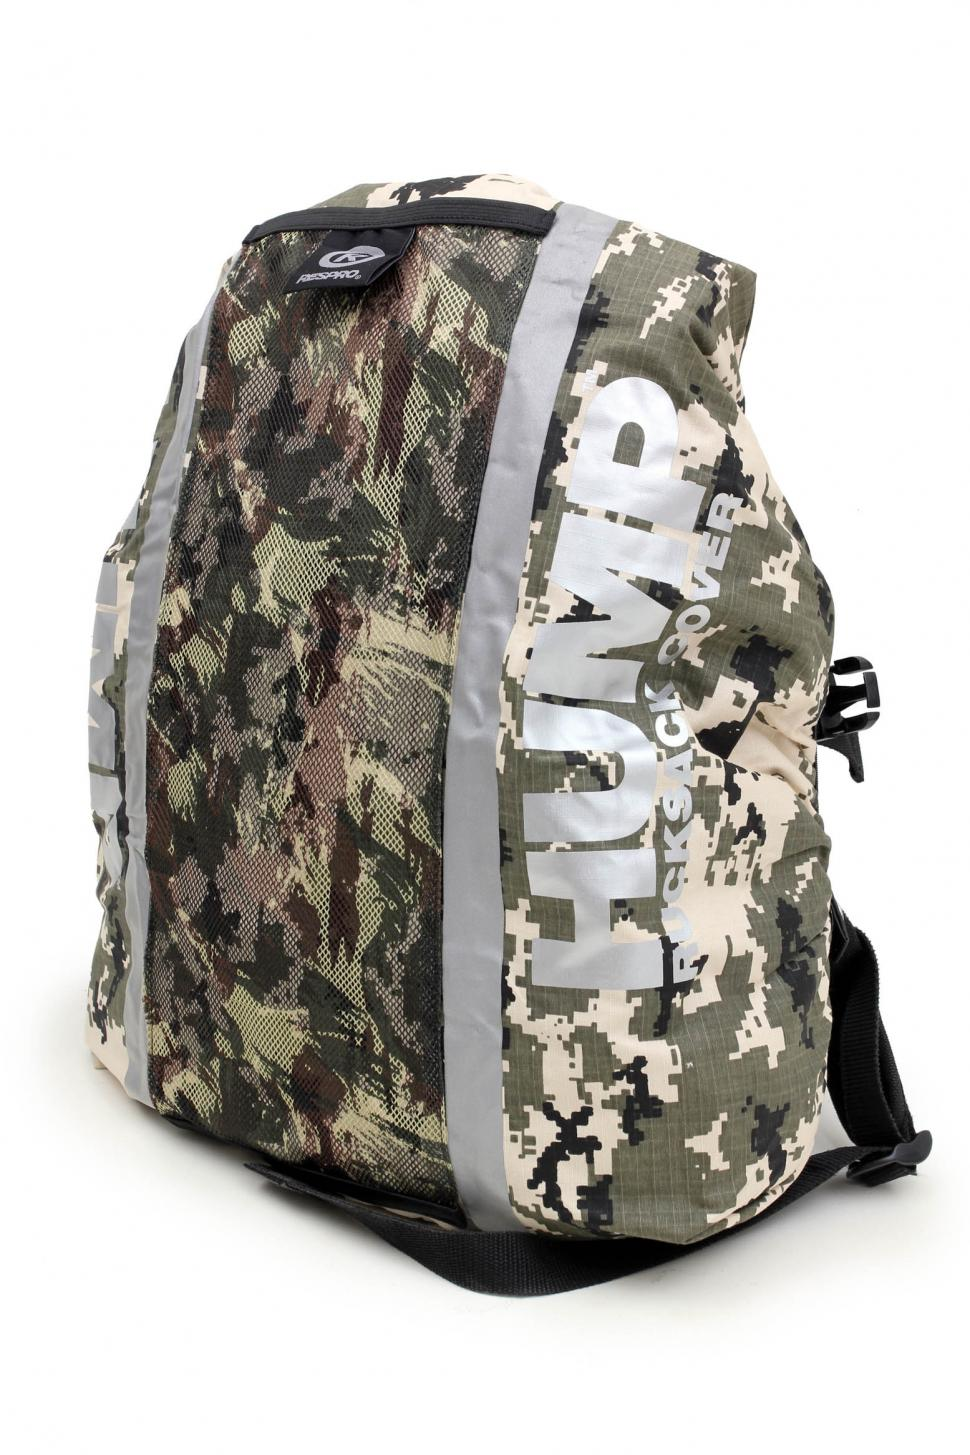 Respro Hump rucksack cover camo